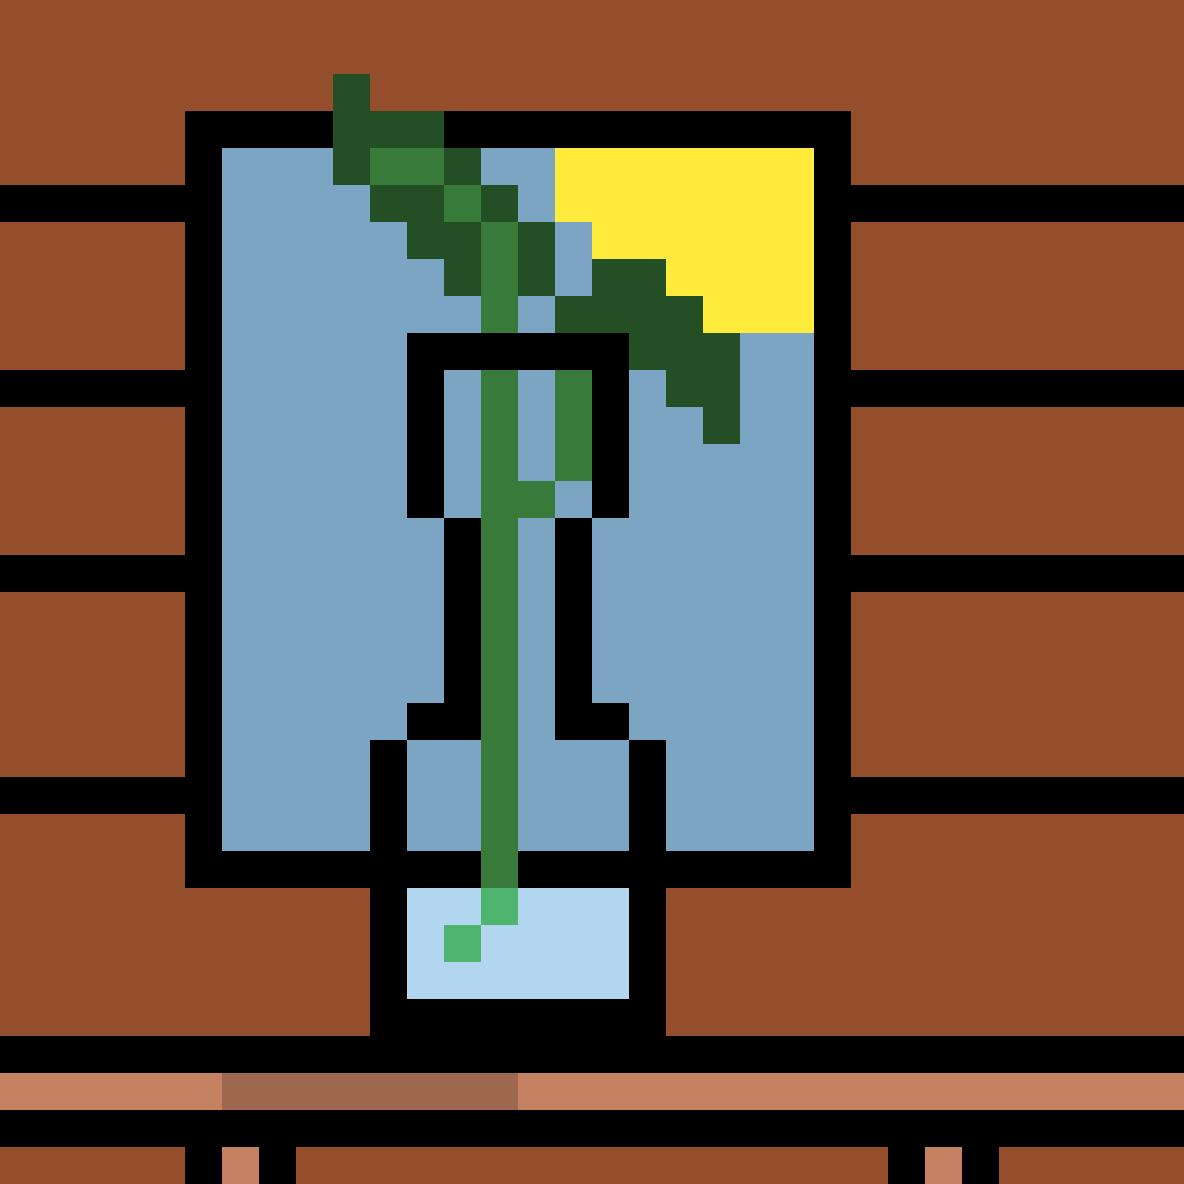 Planted Vase by Mineninja